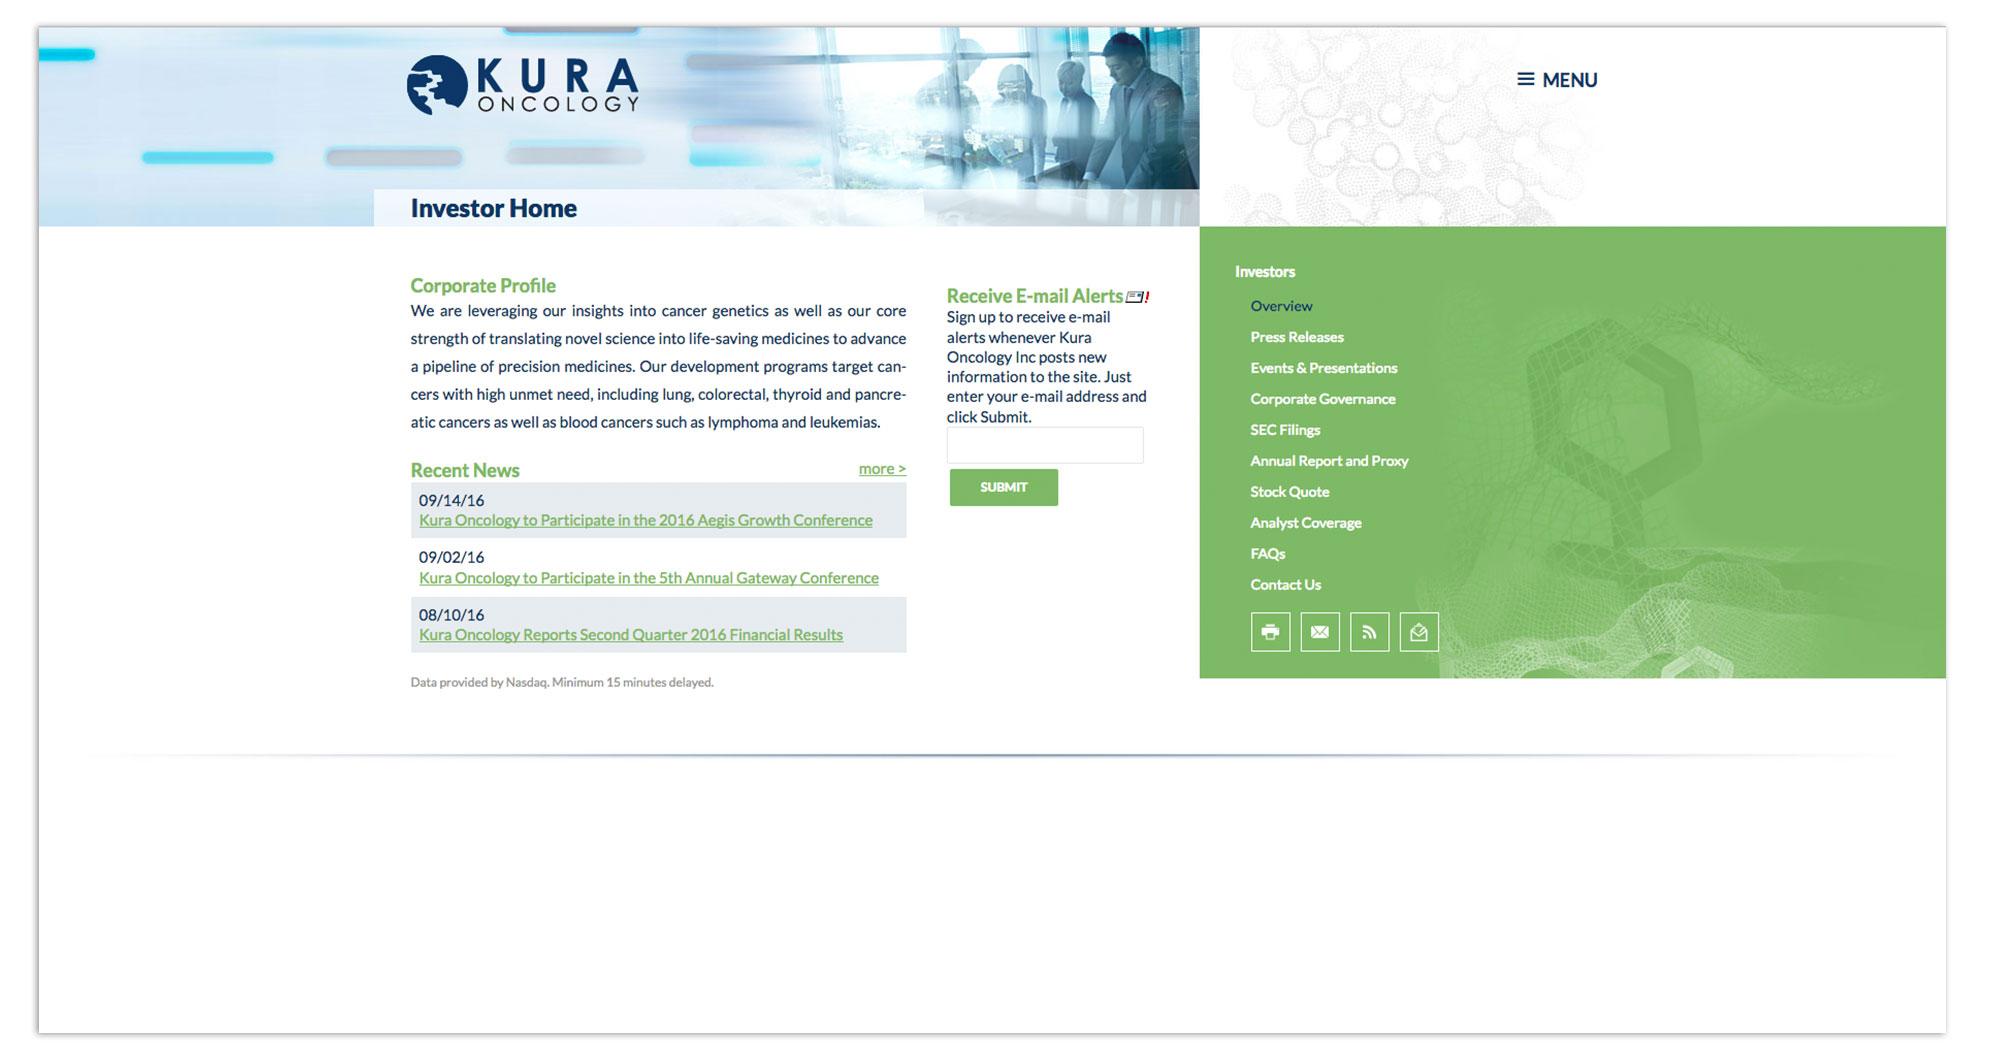 Kura Oncology Web Design Interior